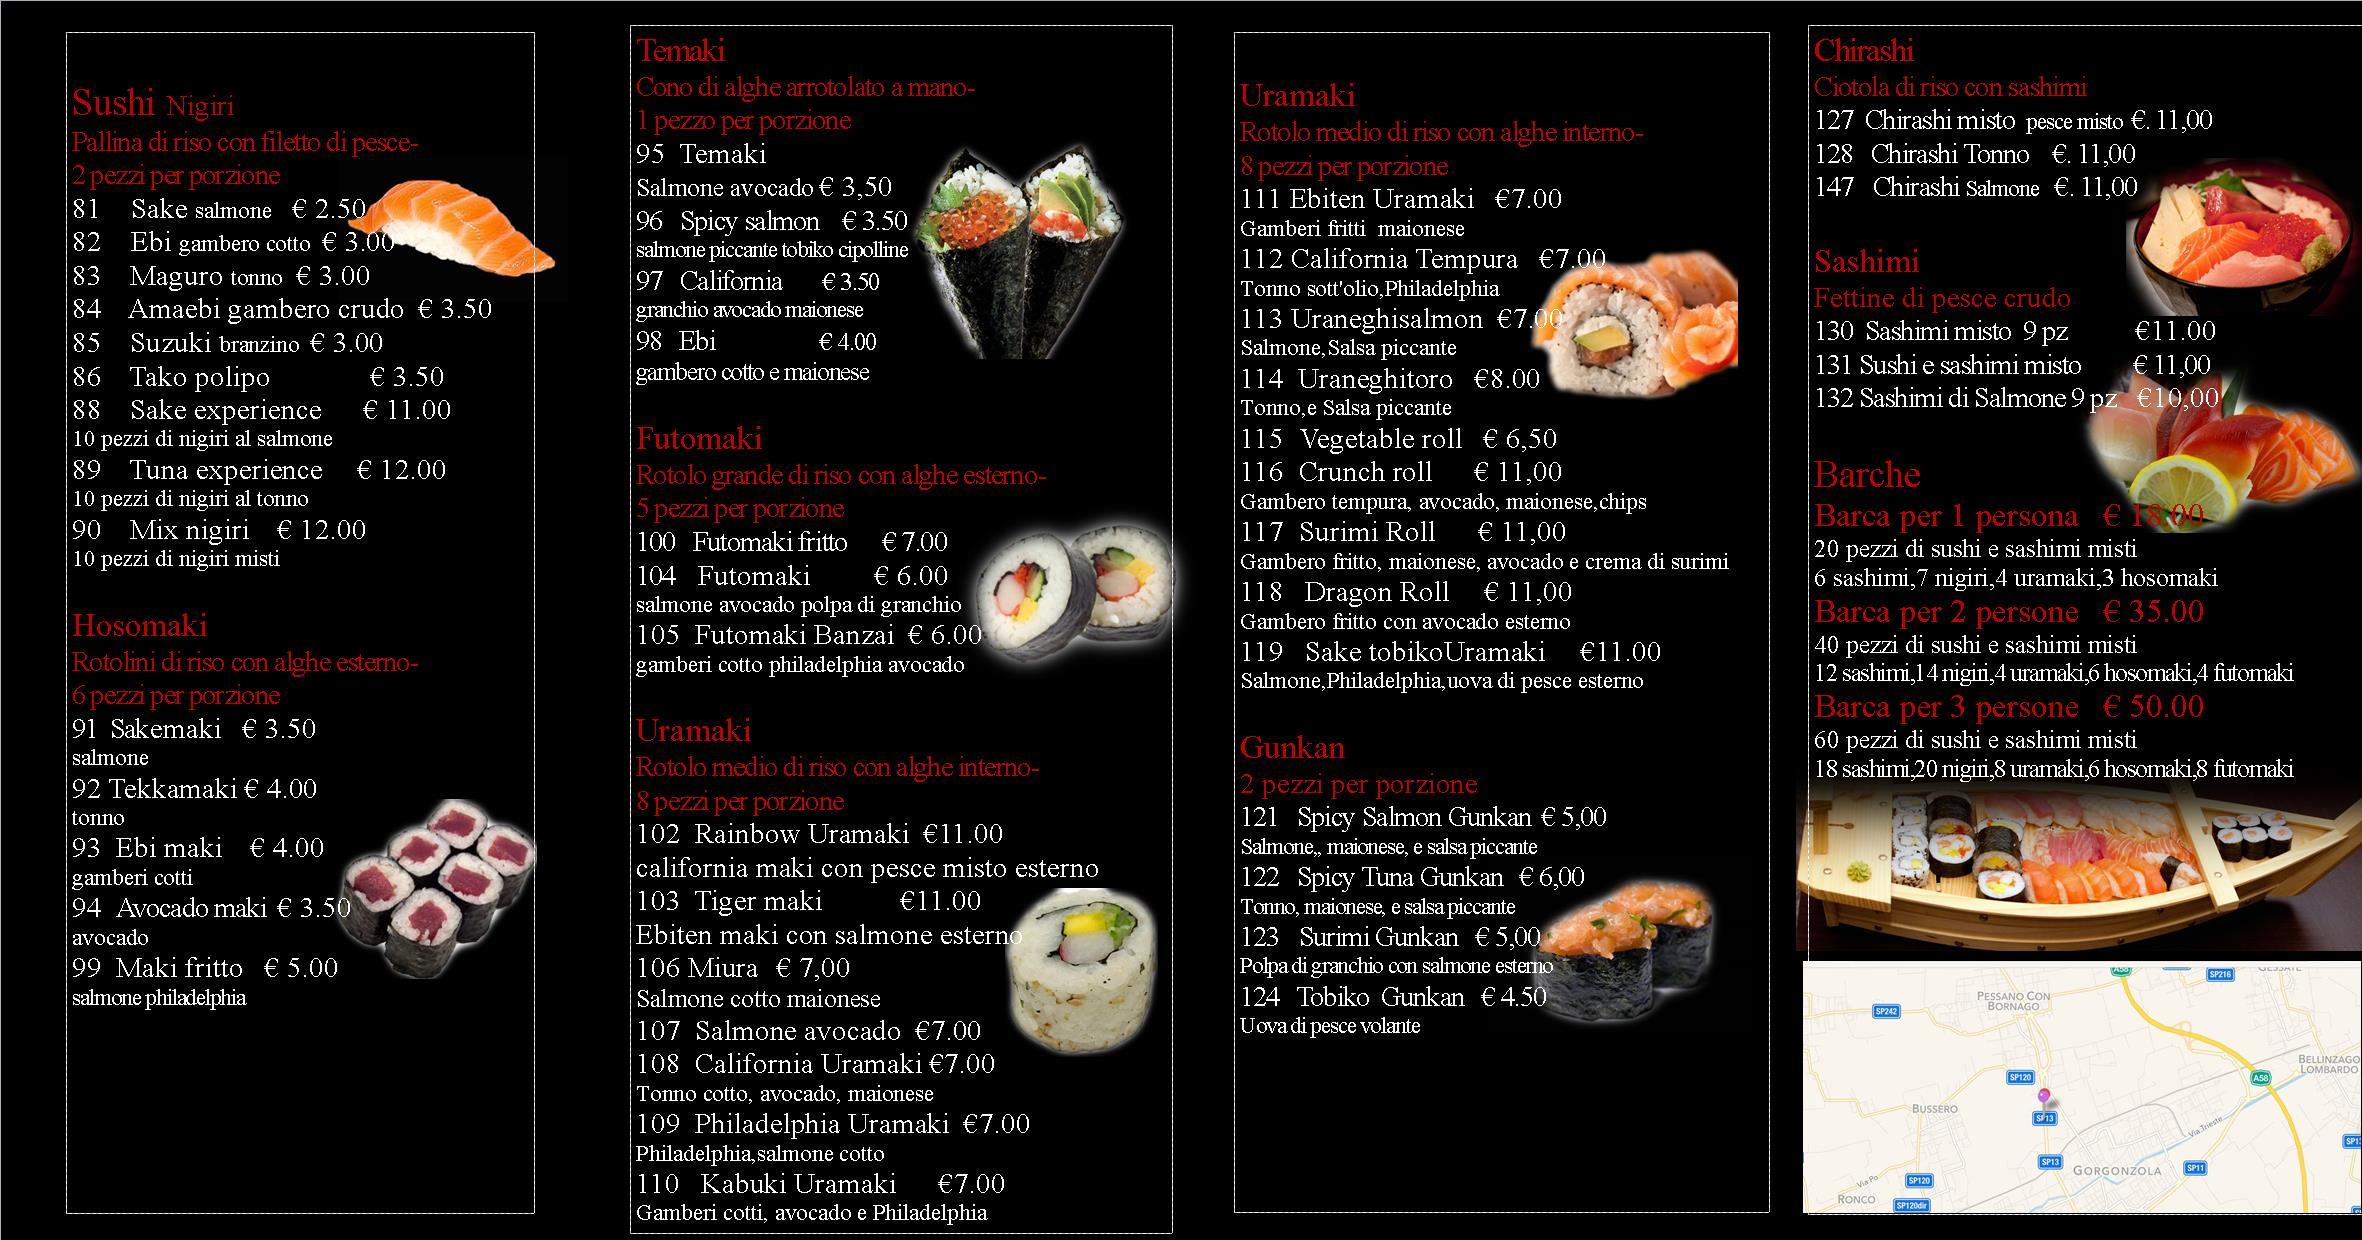 Sushi House , Via Monza 20 Gorgonzola.